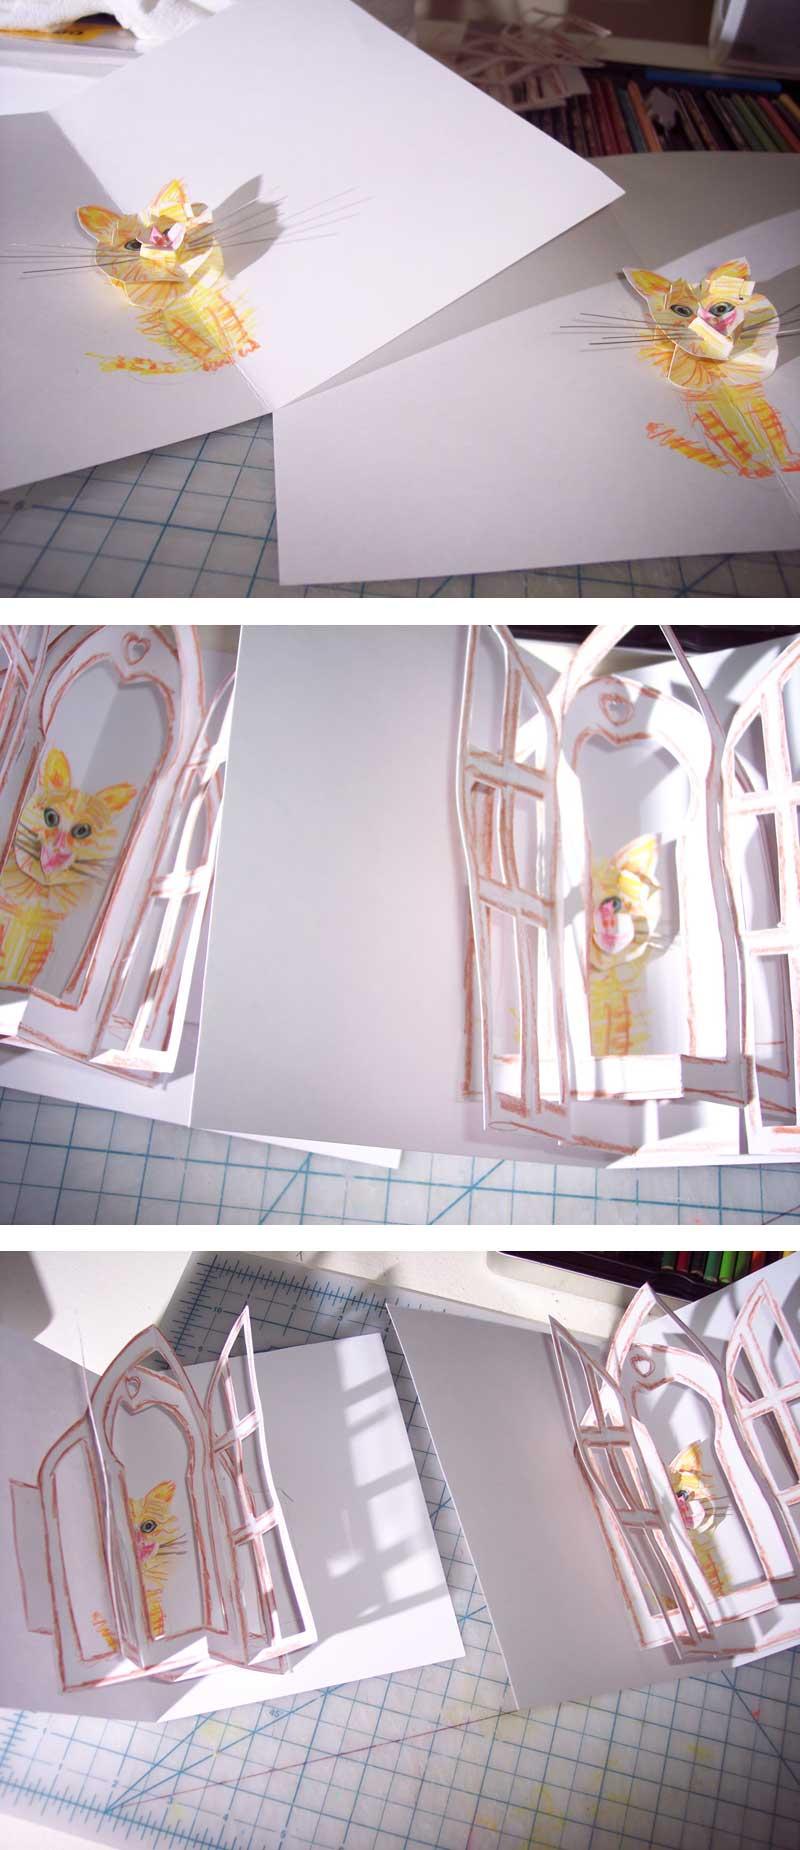 kitty pop-up card 9,10,11